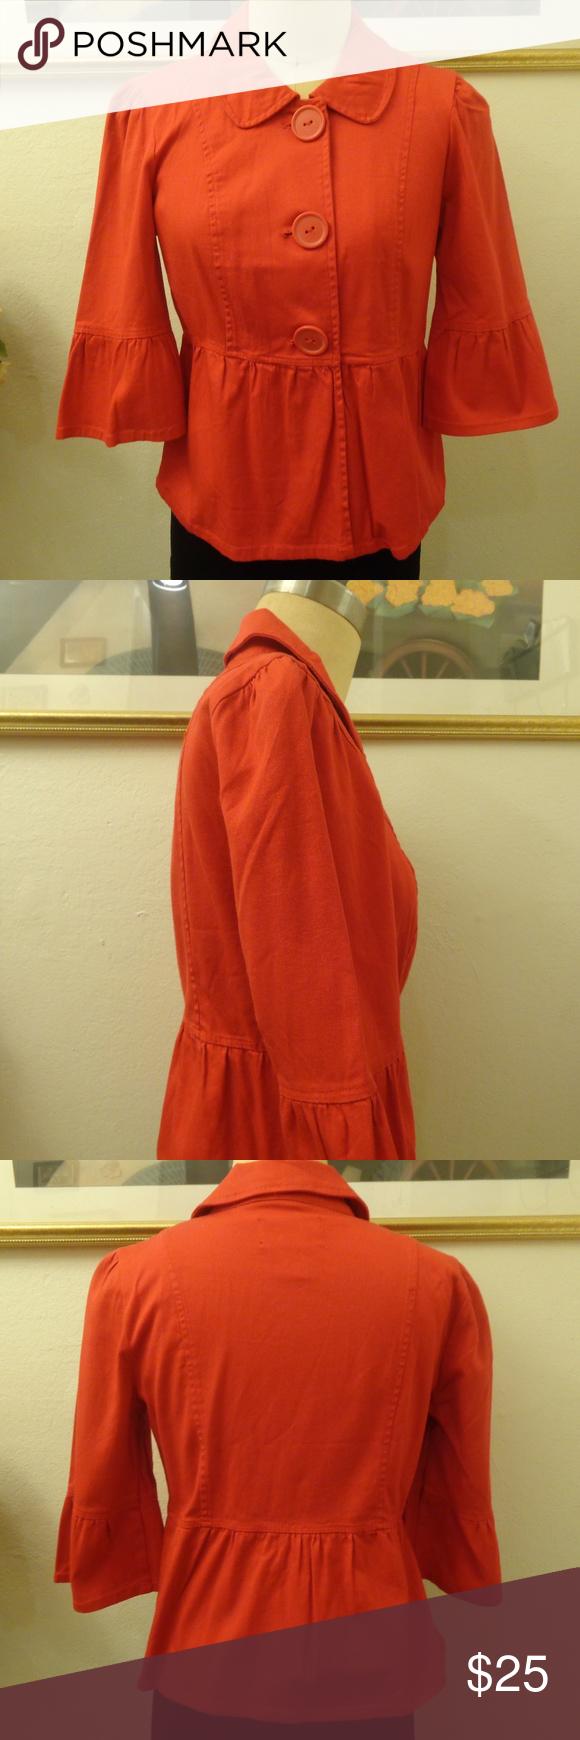 Paris Blues Outerwear Red Jacket Blue Outerwear Red Jacket Clothes Design [ 1740 x 580 Pixel ]